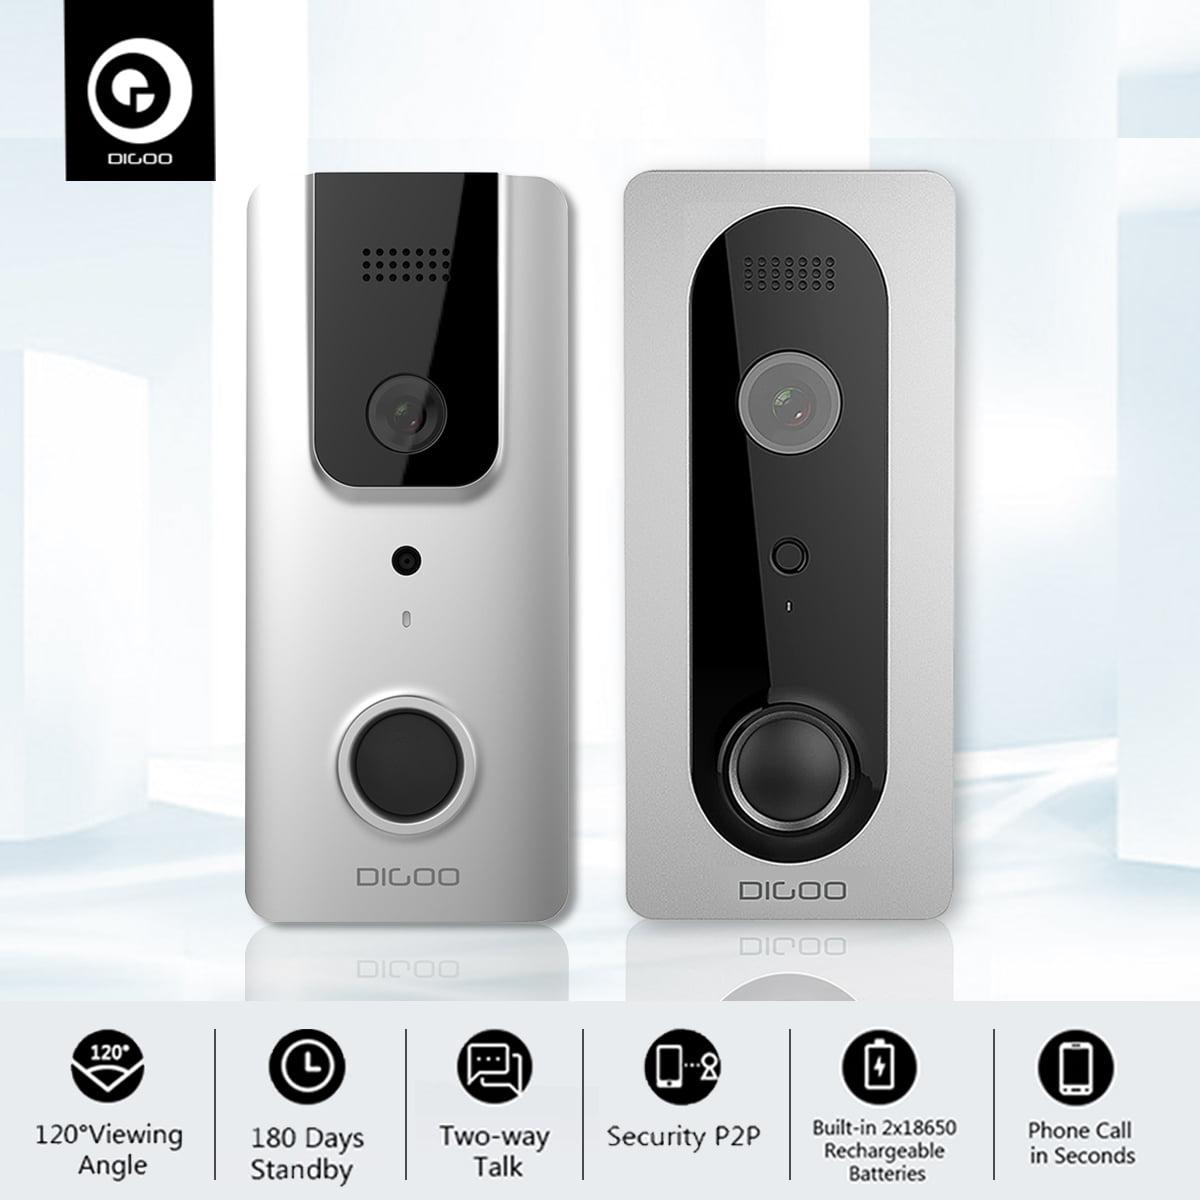 DIGOO 1080P WiFi Ring DoorBell with Camera ,Waterproof Smart Home Night Visual Video Door Bell,Security Camera Phone App Control, Intercom Alarm Clear Night Vision